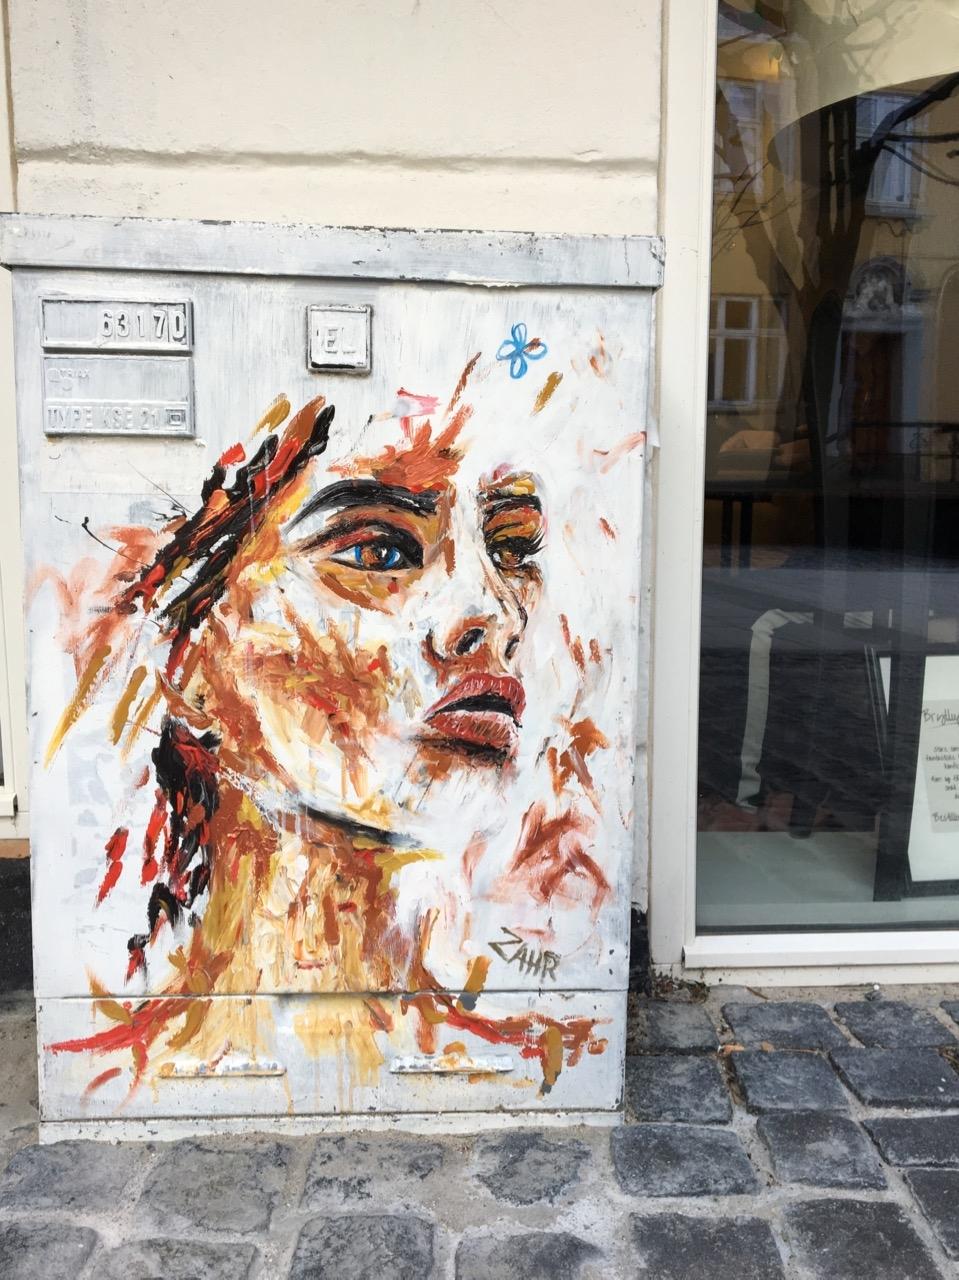 Streetart_eltavle_noerregade_aalborg